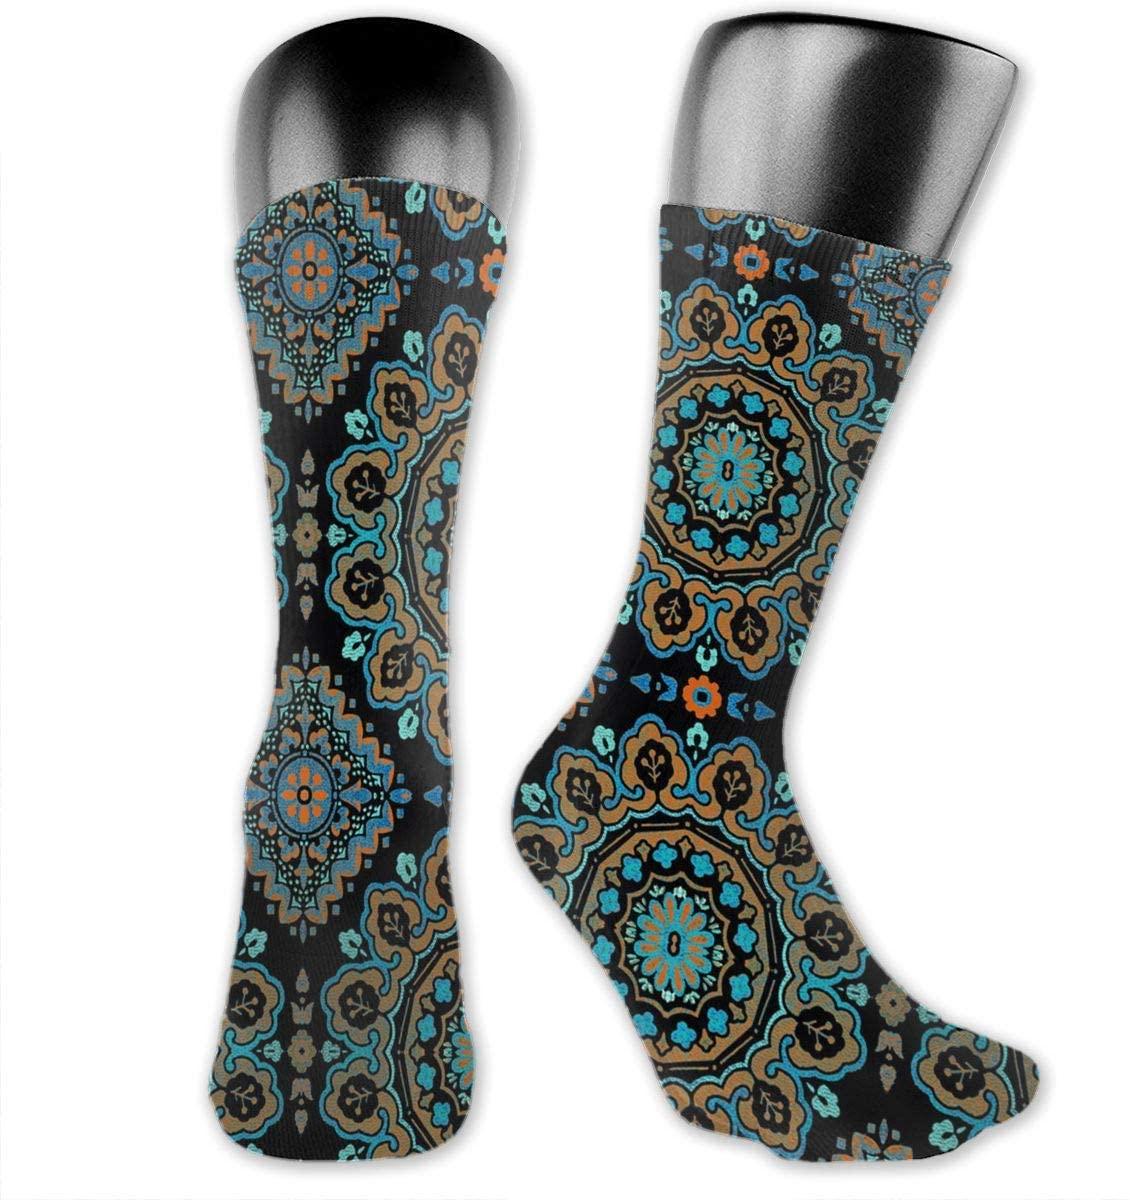 Moroccan Multi Unisex Outdoor Long Socks Sport Athletic Crew Socks Stockings